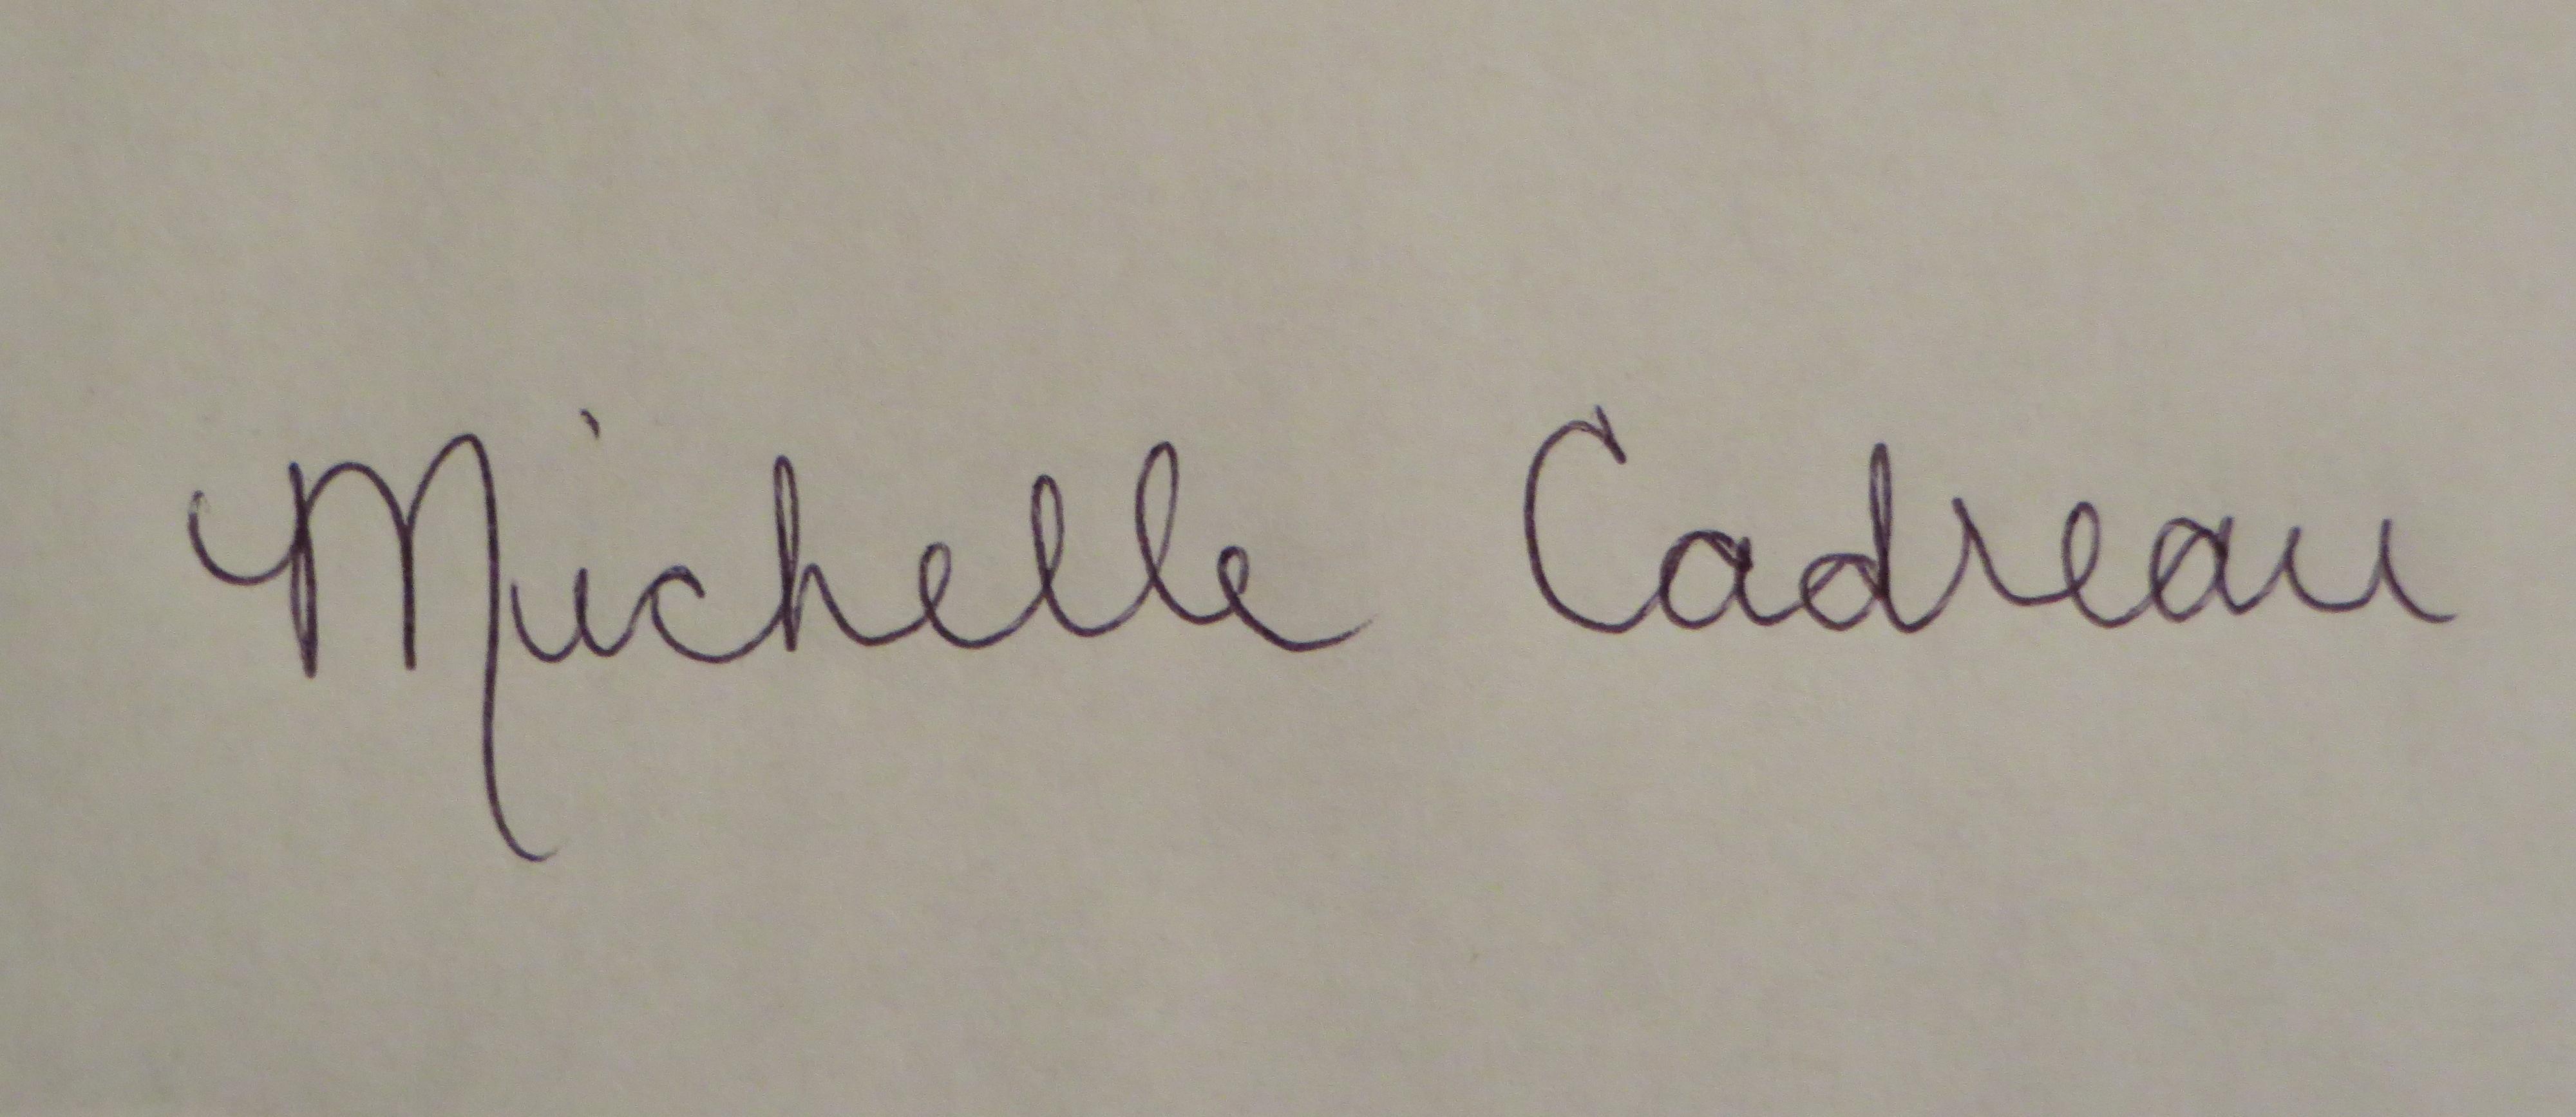 Michelle Cadreau's Signature